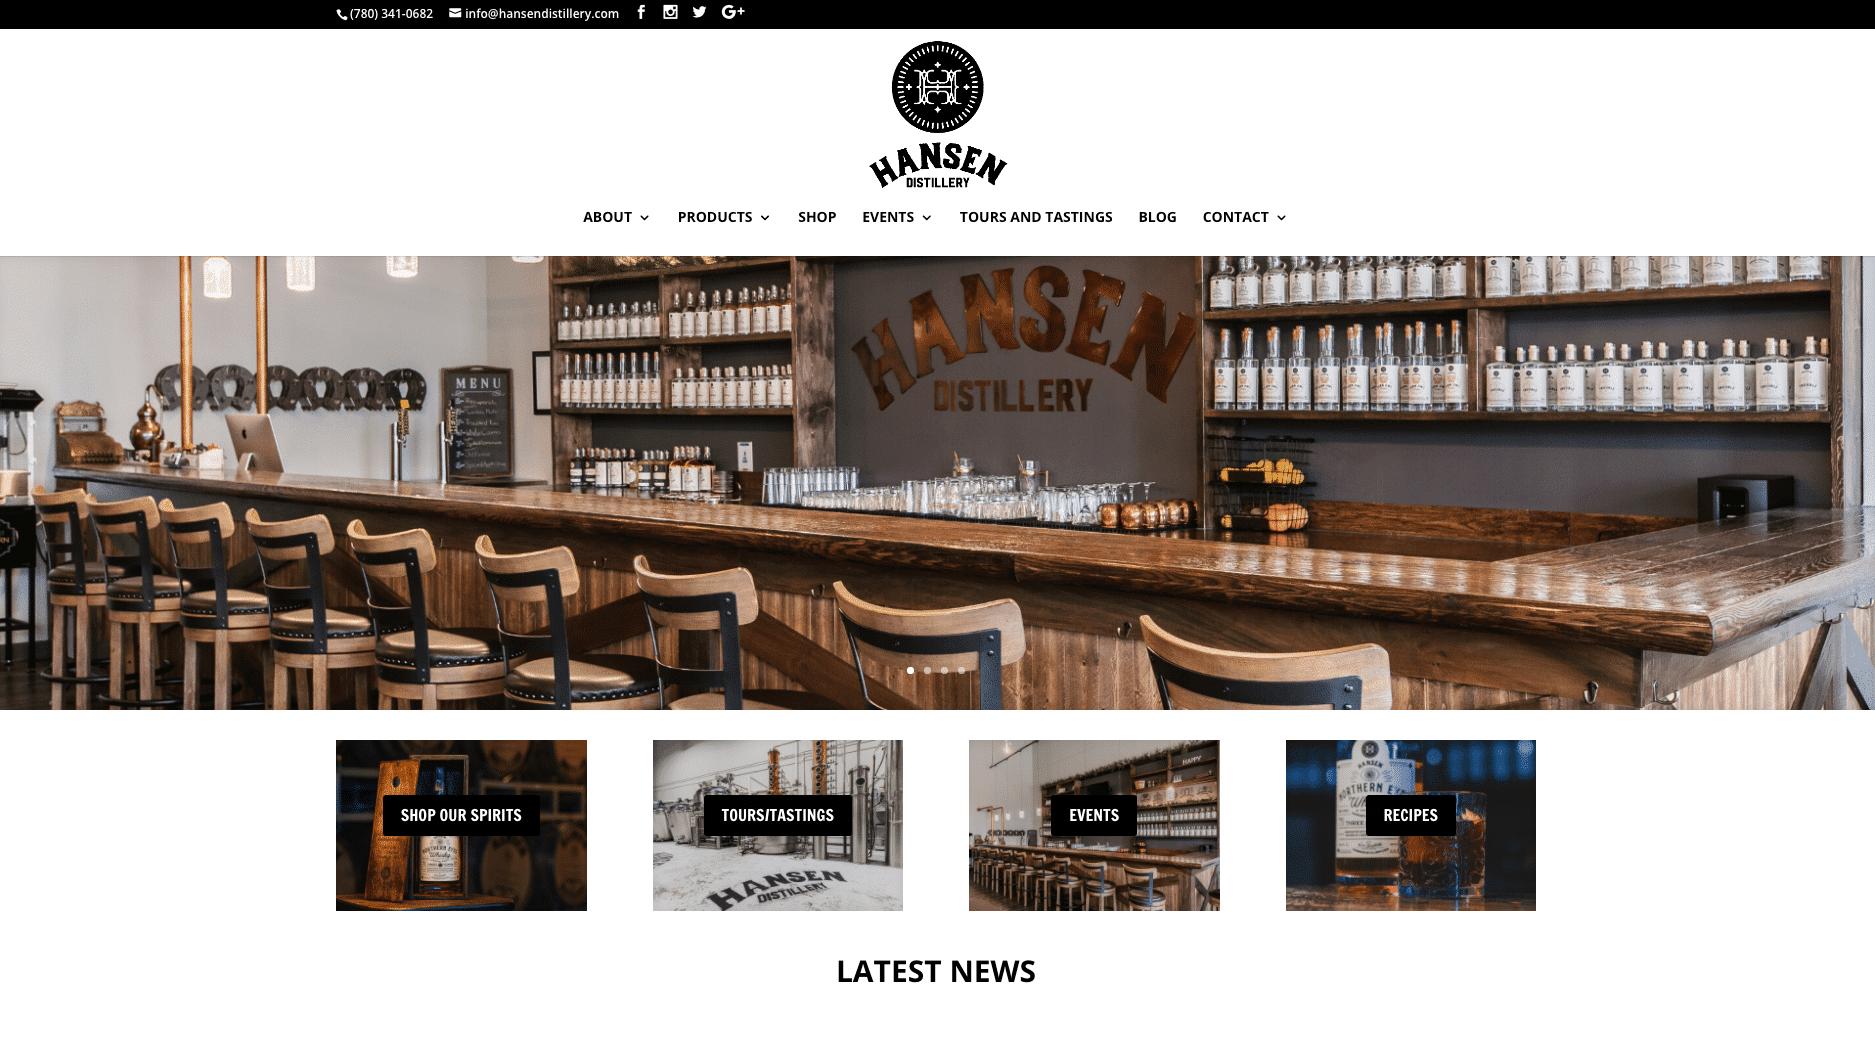 Hansen Distillery(スピリッツ&イベント会場)